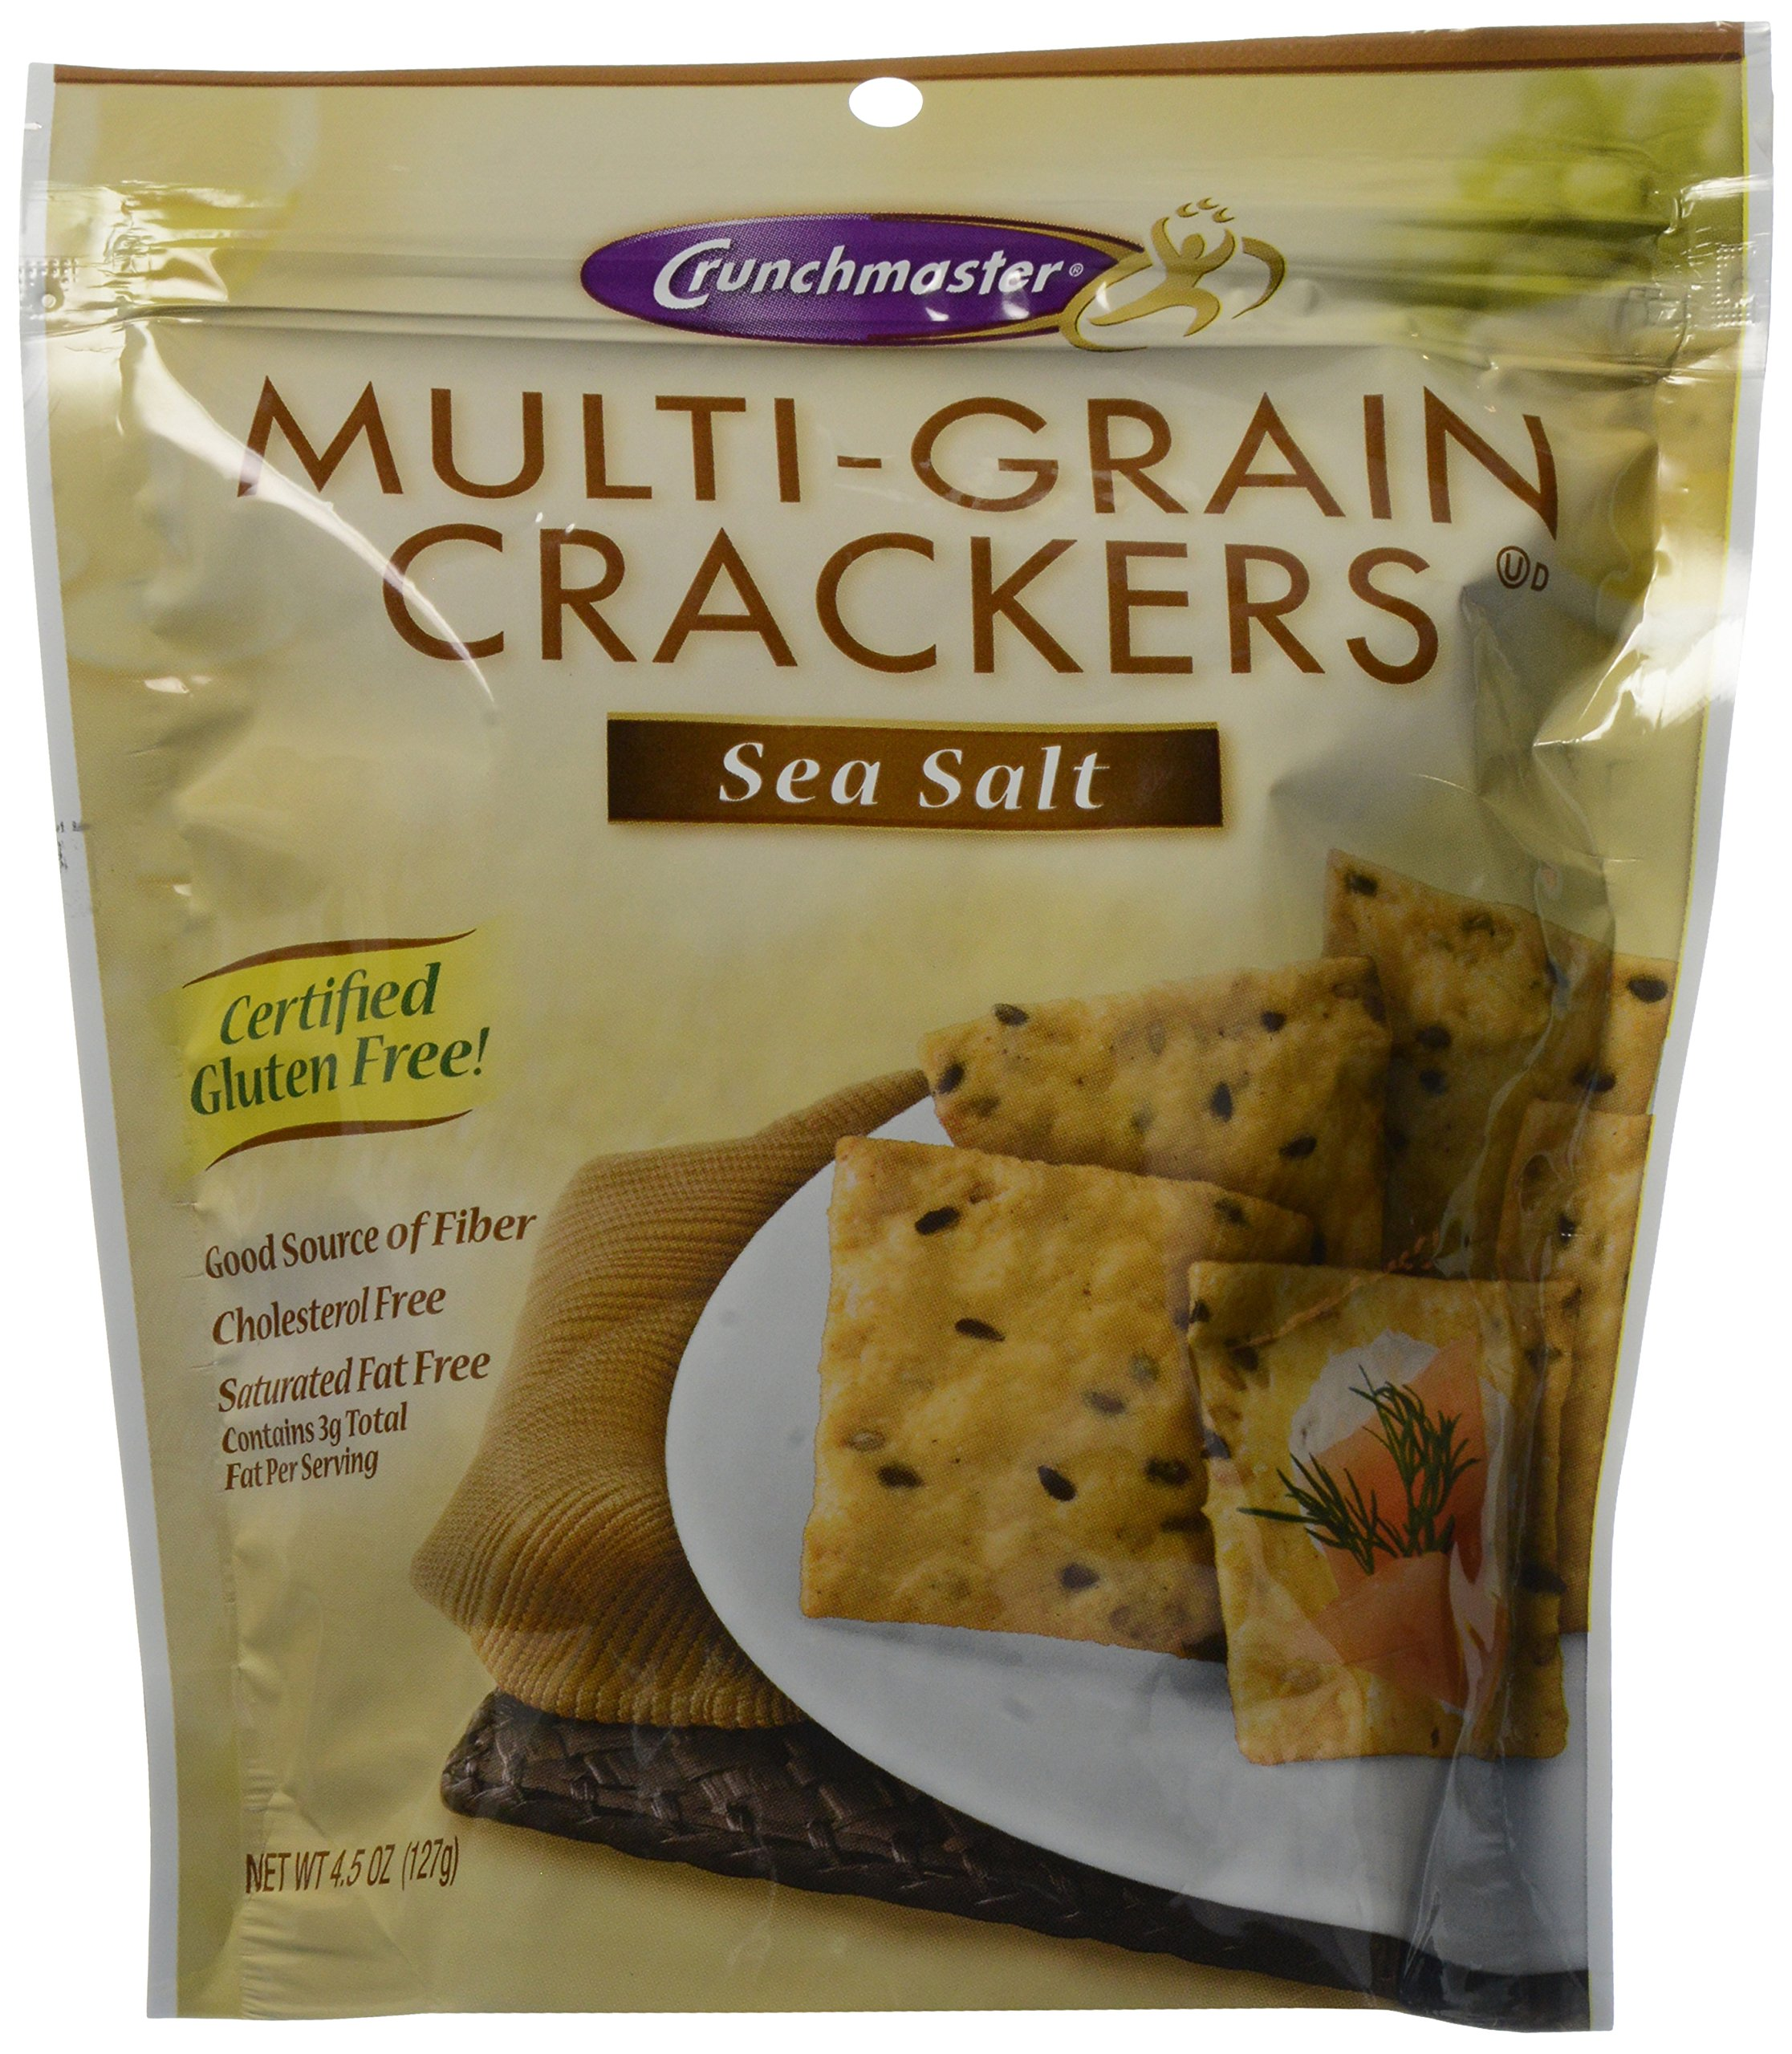 Crunchmaster Multi-Grain Crackers, Sea Salt, 4.5 Ounce (Pack of 6) by Crunchmaster